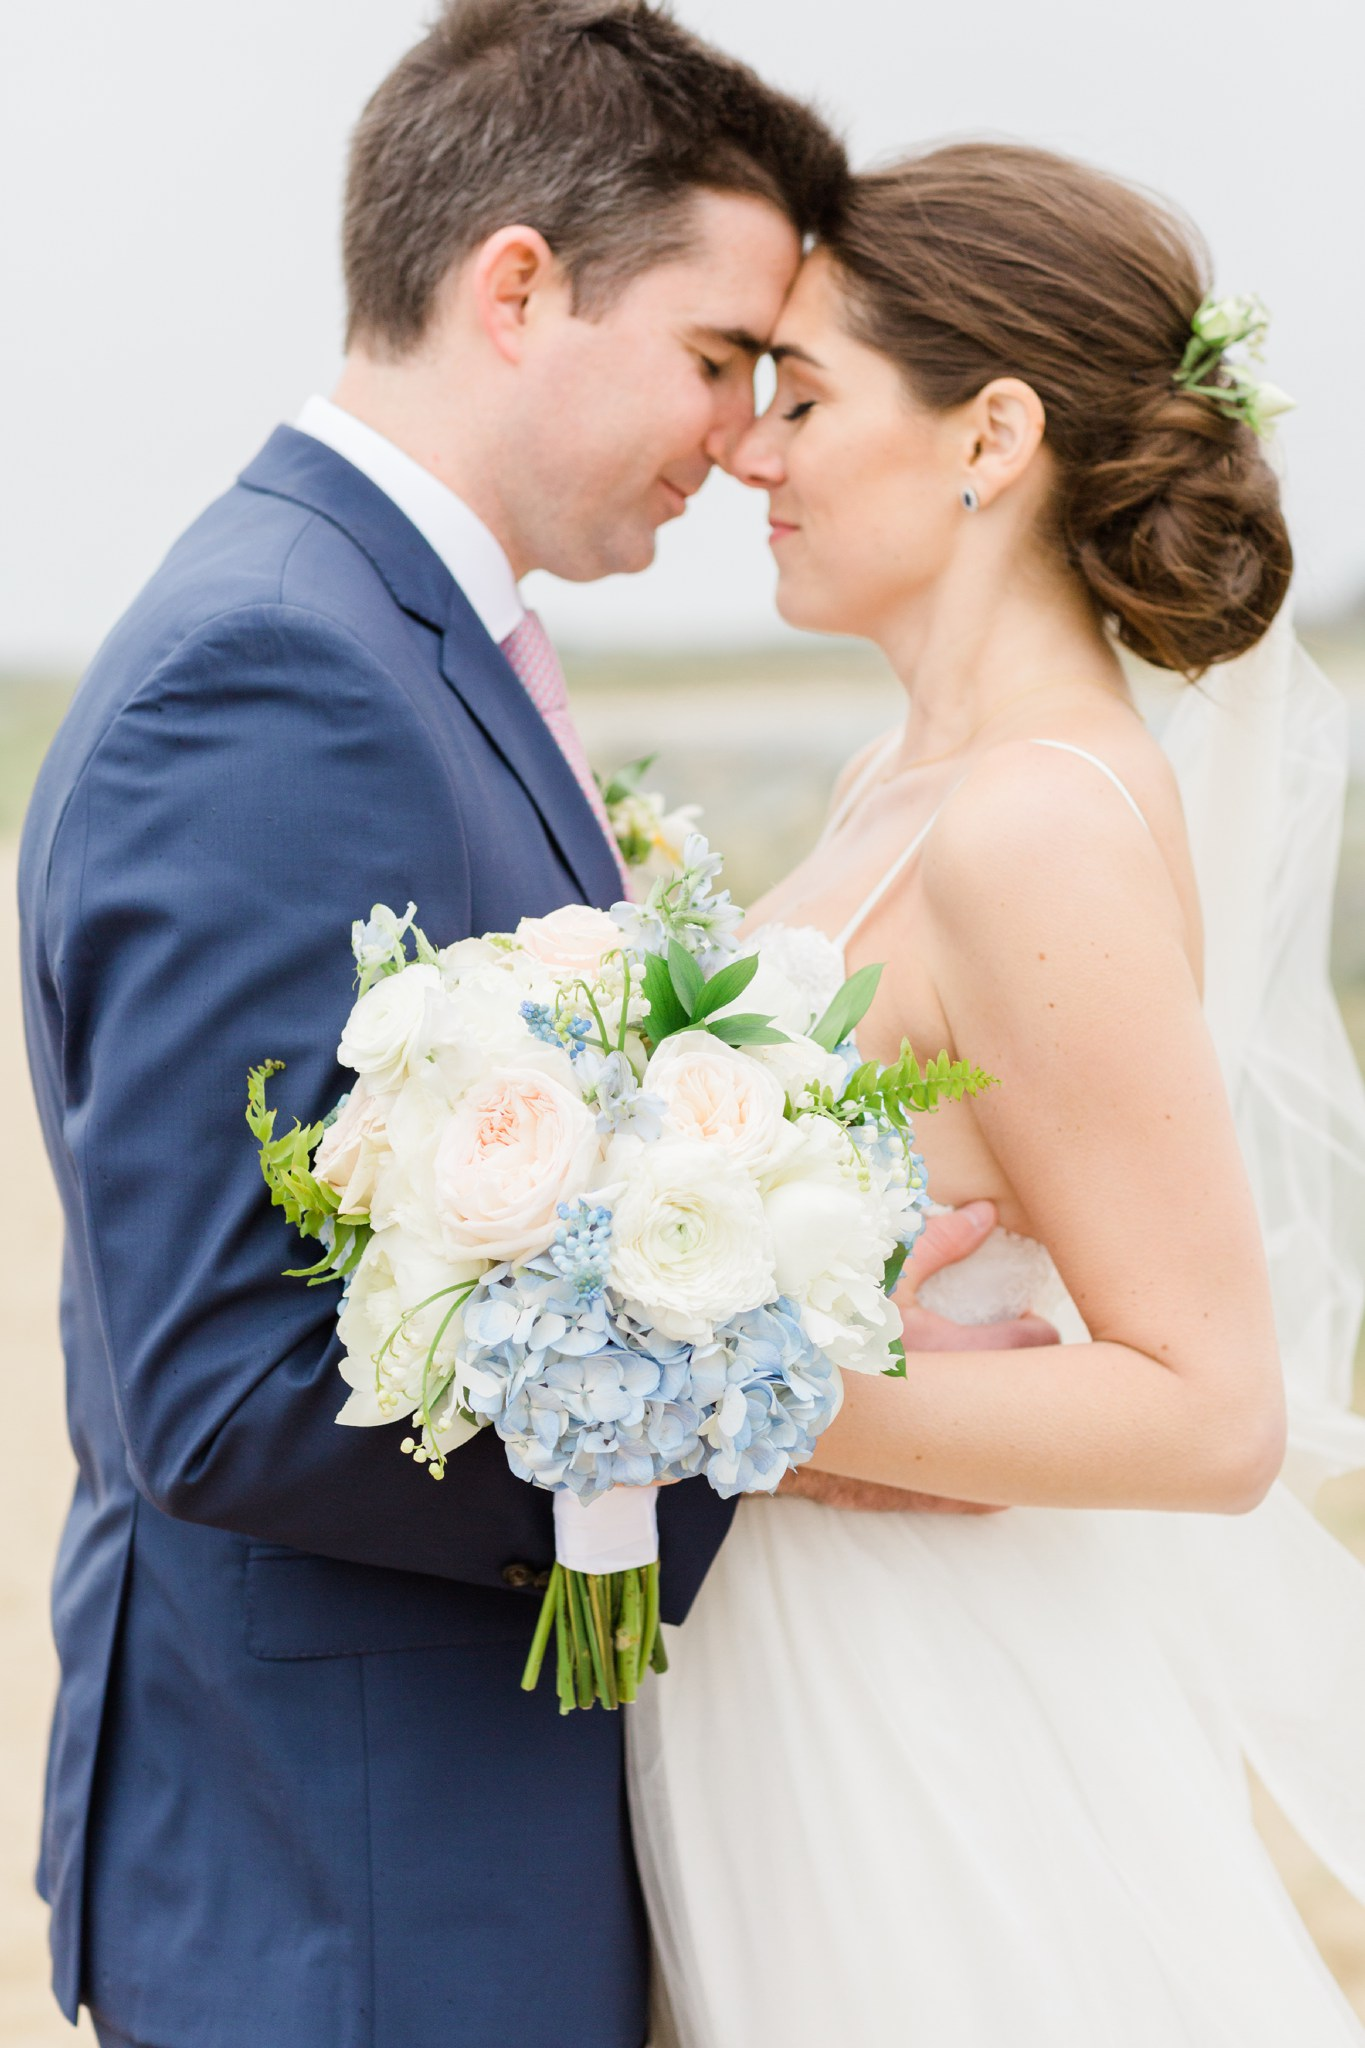 cape_cod_wedding_deborah_zoe_Photography_00041.JPG